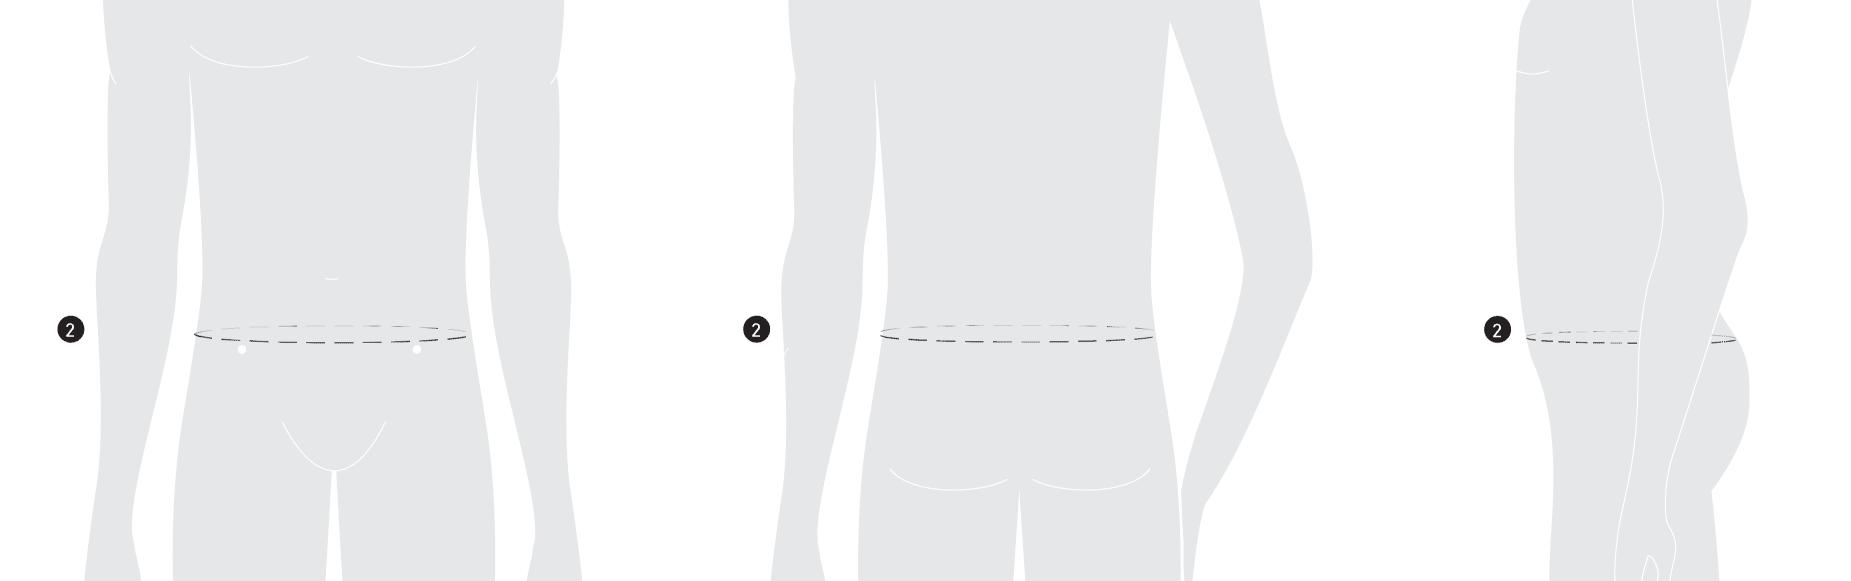 b2b9b66e Norrøna size guide - find your perfect fit - Norrøna®